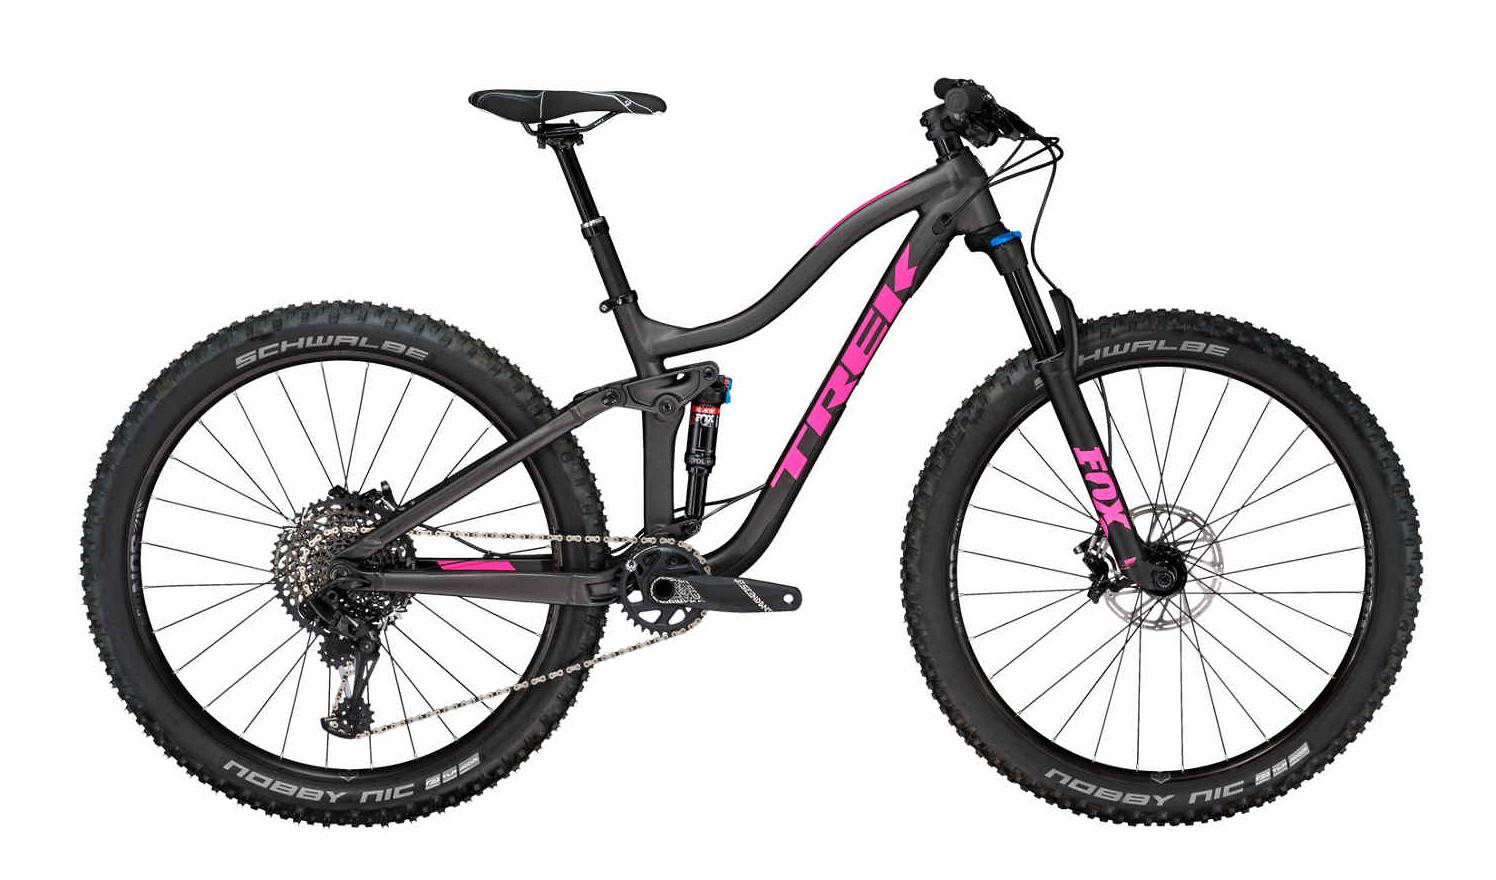 2018 trek fuel ex 8 women 39 s bike reviews comparisons. Black Bedroom Furniture Sets. Home Design Ideas